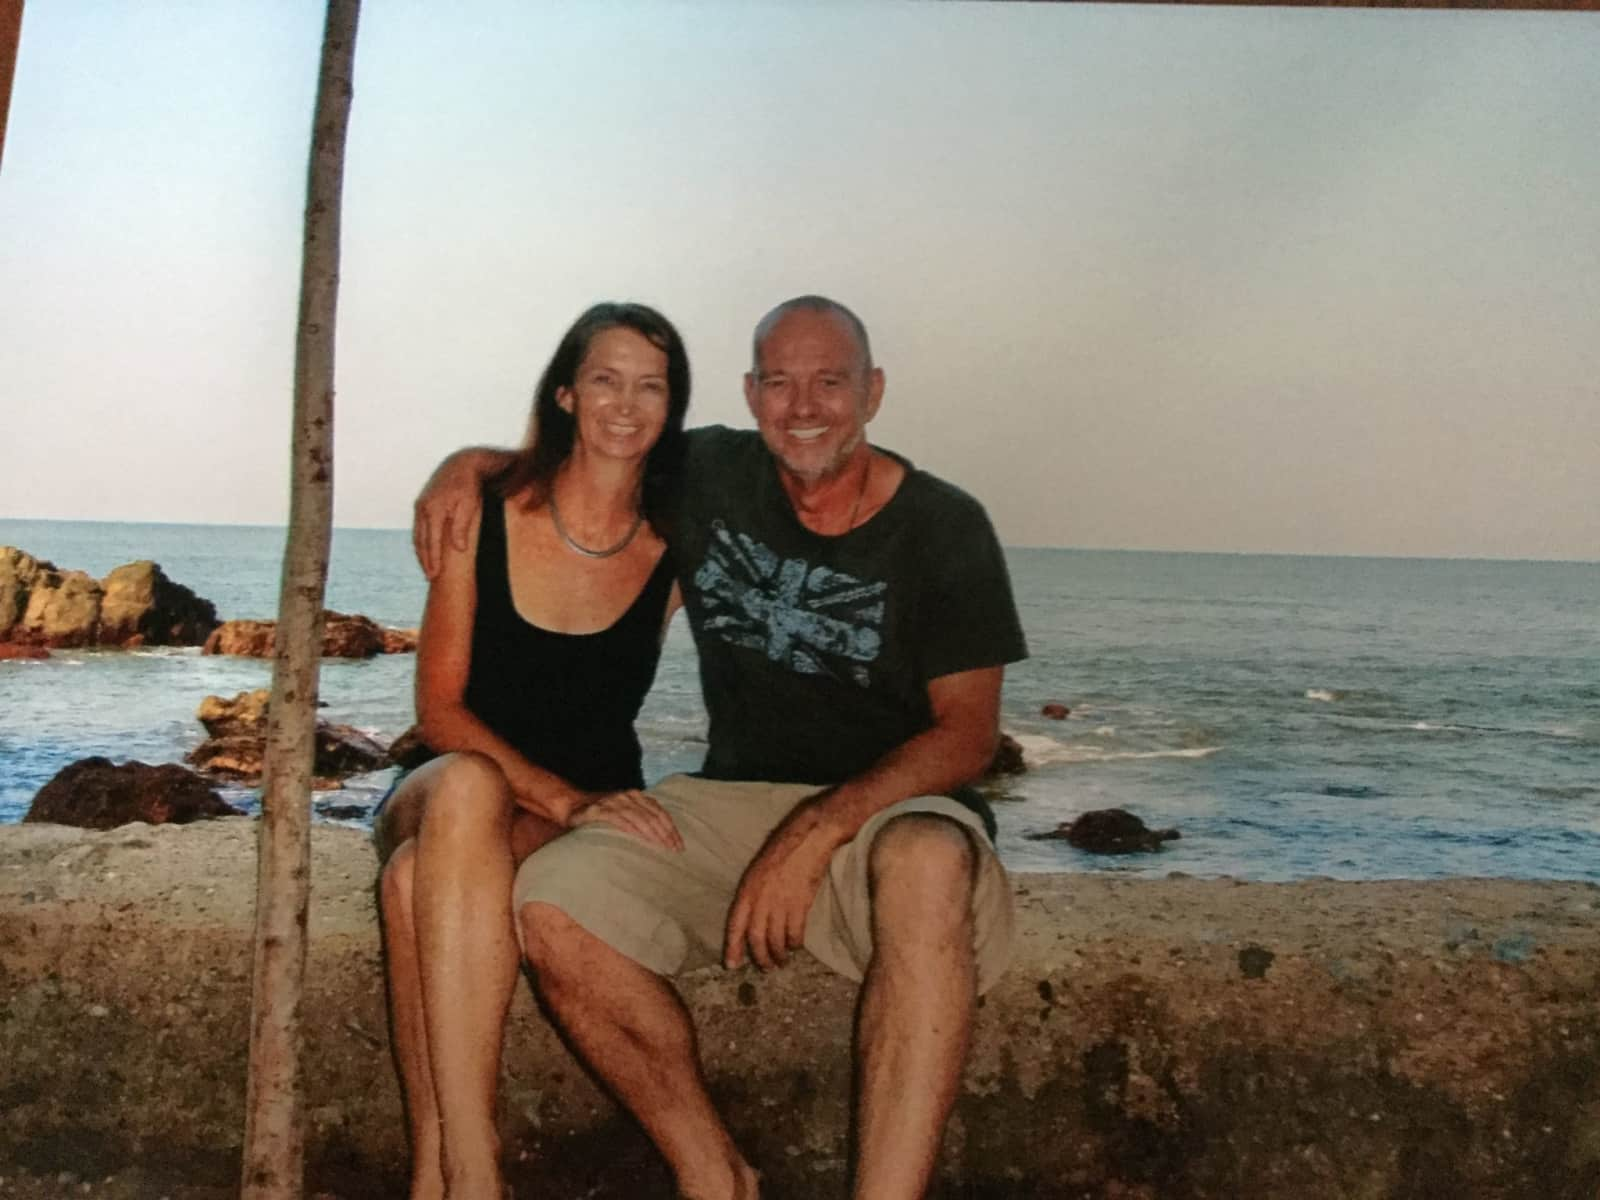 Anne & David from Perth, Western Australia, Australia